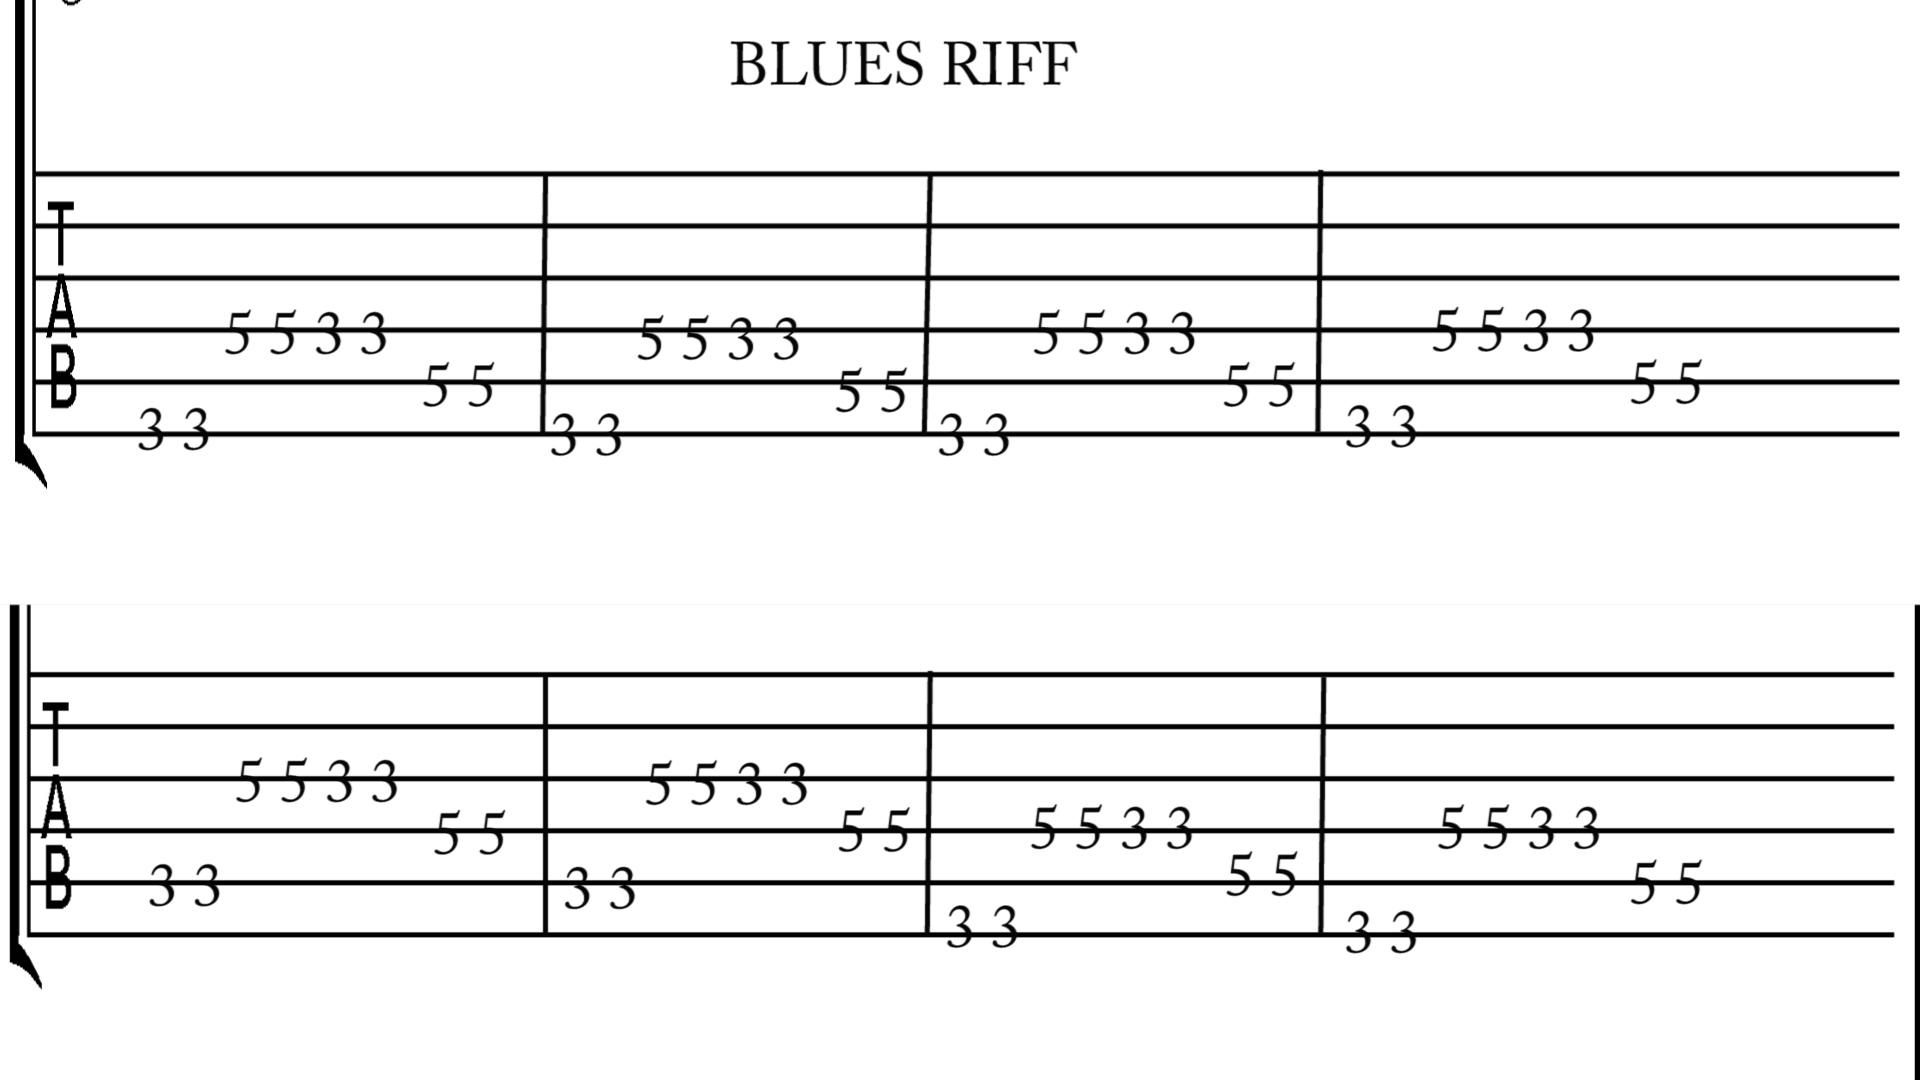 Guitar Bar Chords Chart Ibovnathandedecker